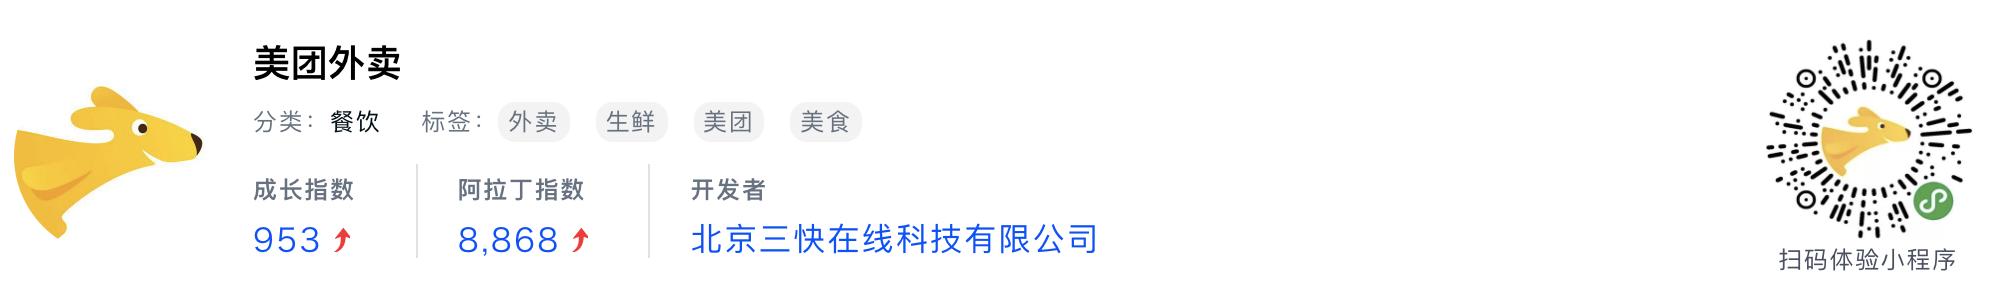 WeChatミニプログラム最新ランキングTOP20【2019年6月版】7位:美团外卖